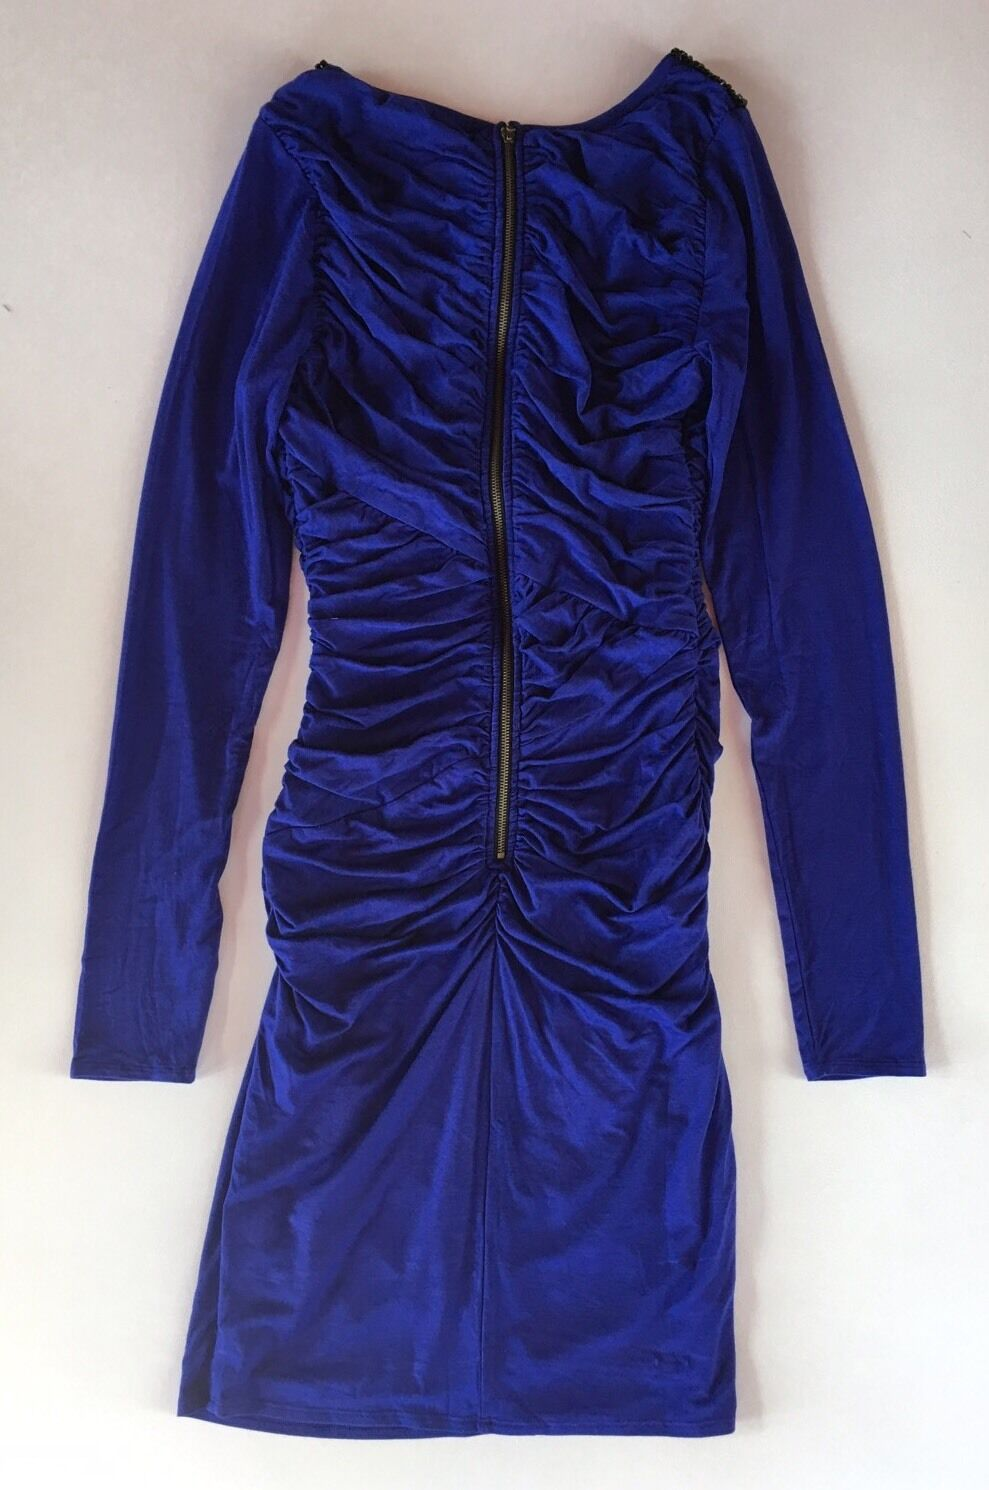 NWT Women's Plenty by by by Tracy Reese bluee purple Embellished Knit Shift Dress-Sz M 43c308